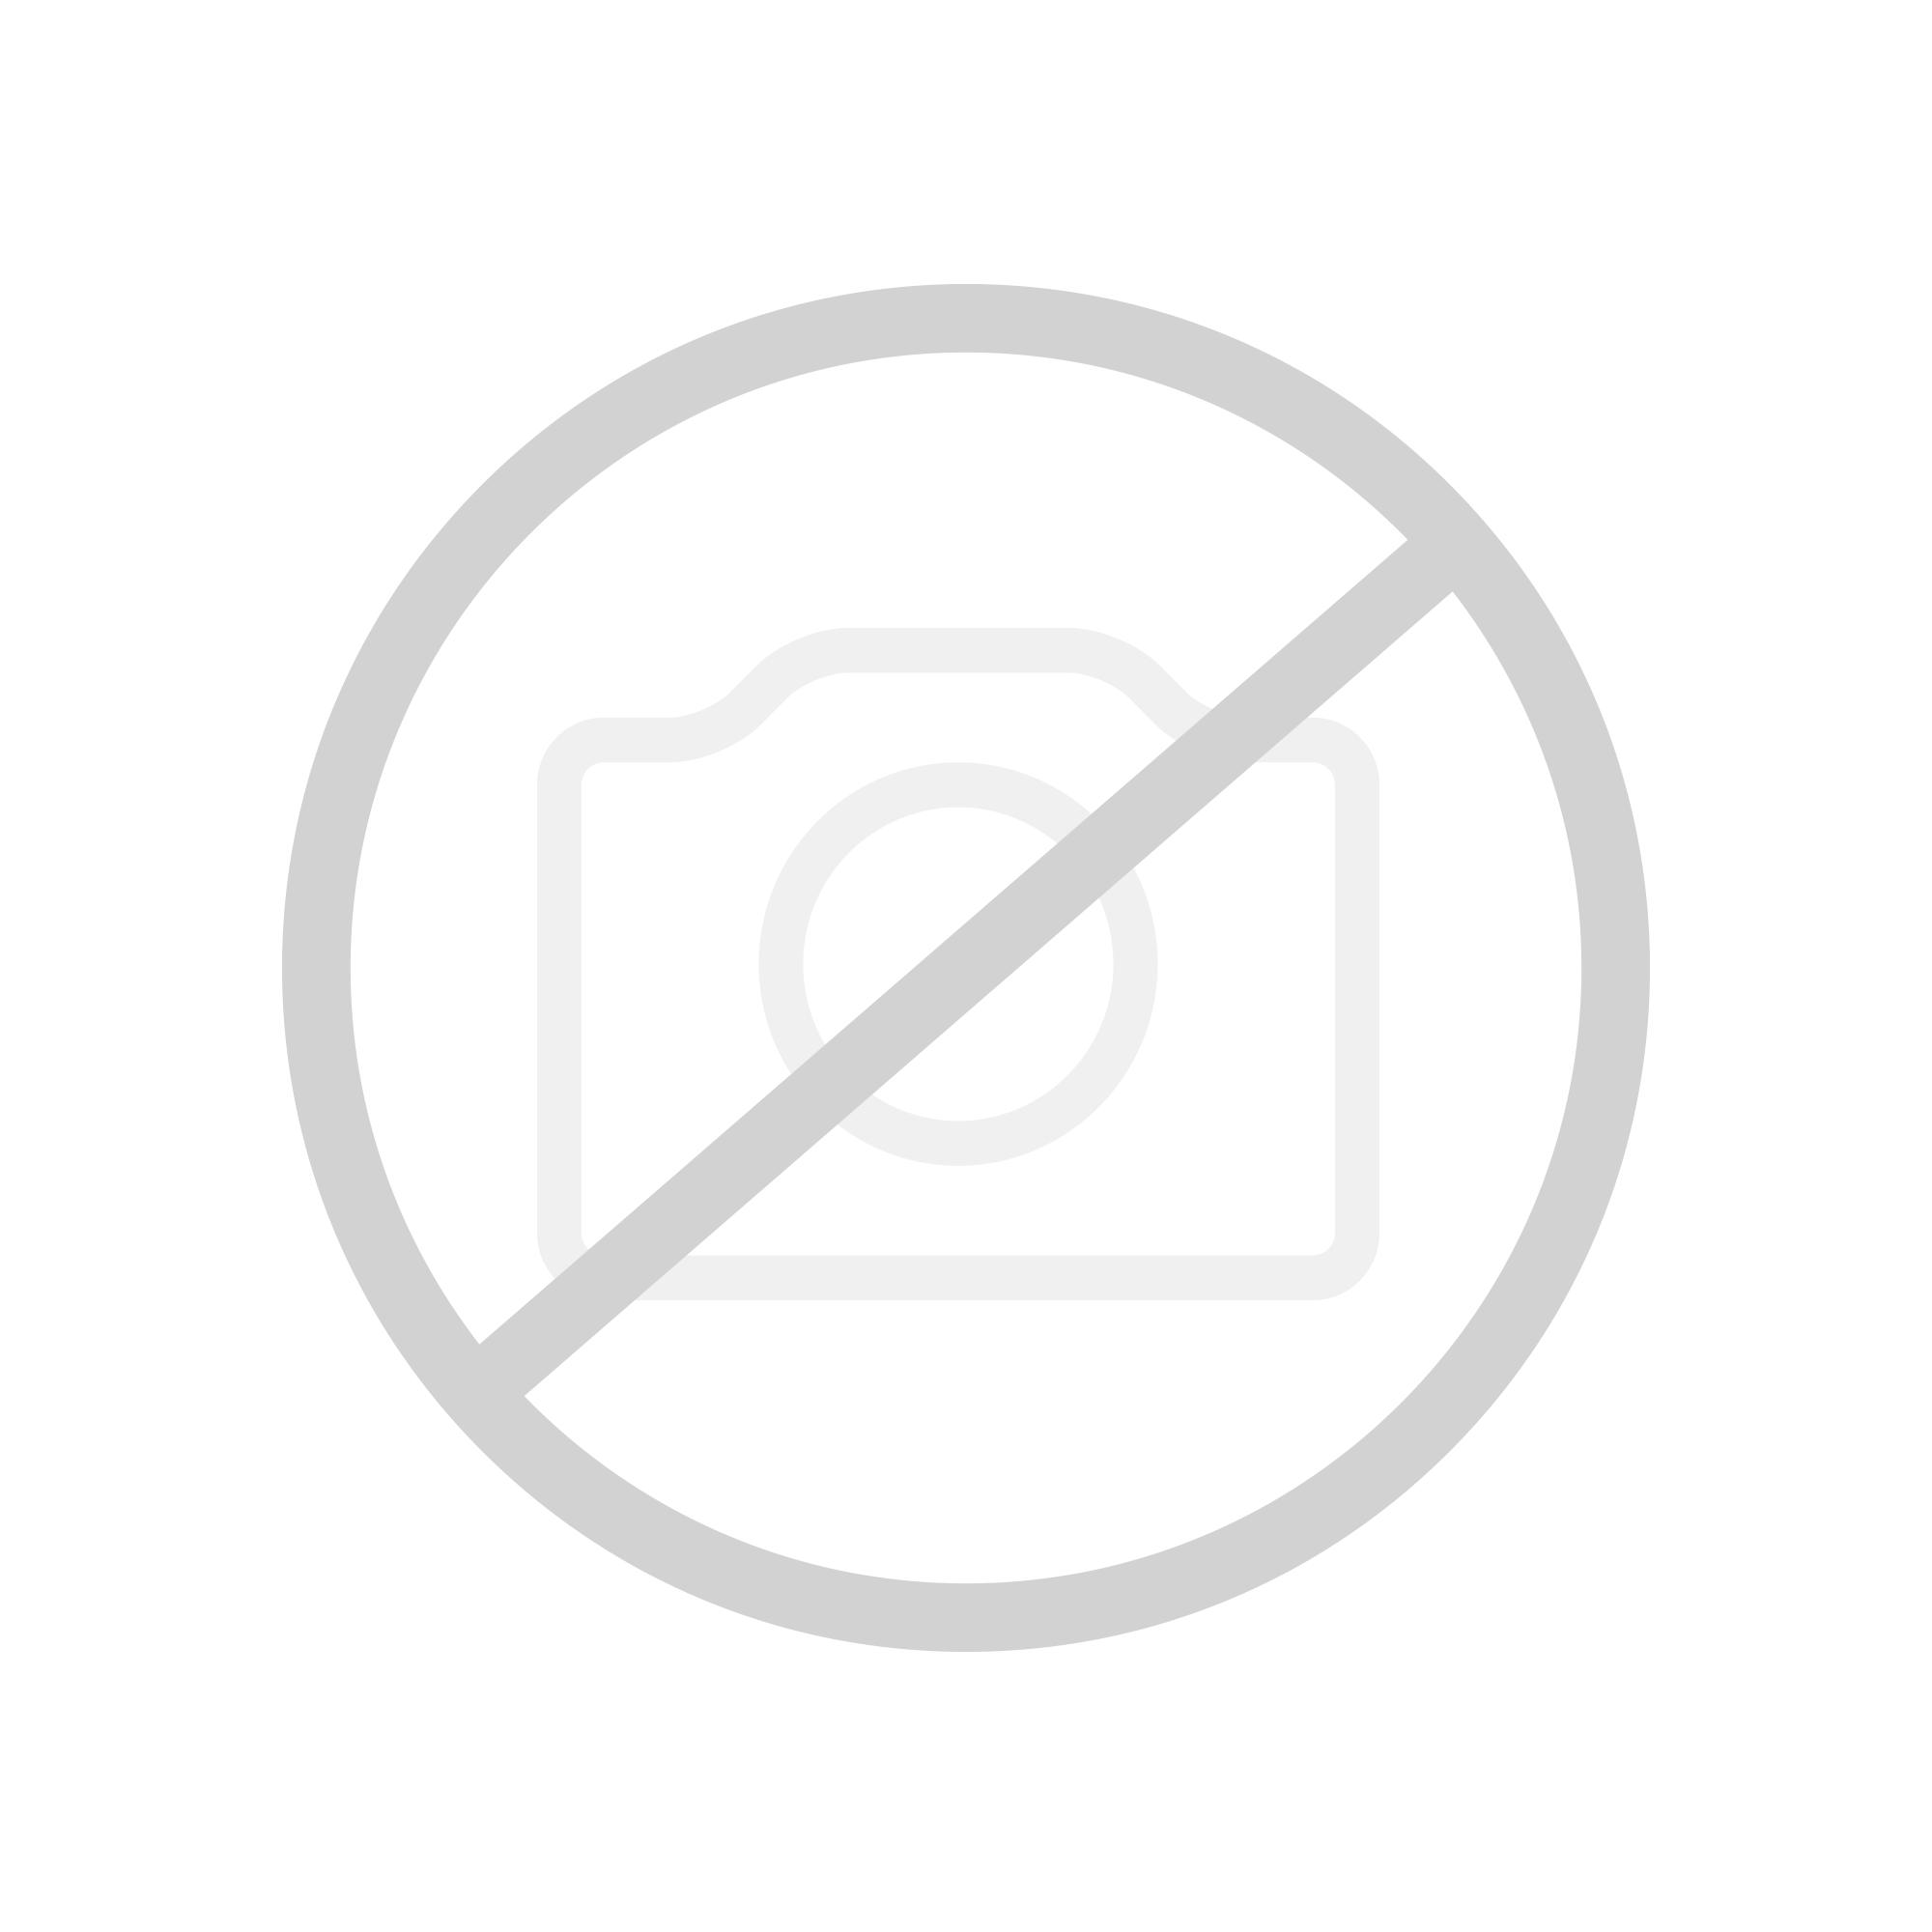 Ideal Standard Connect Wandtiefspülklosett L: 54 B: 36 cm weiß